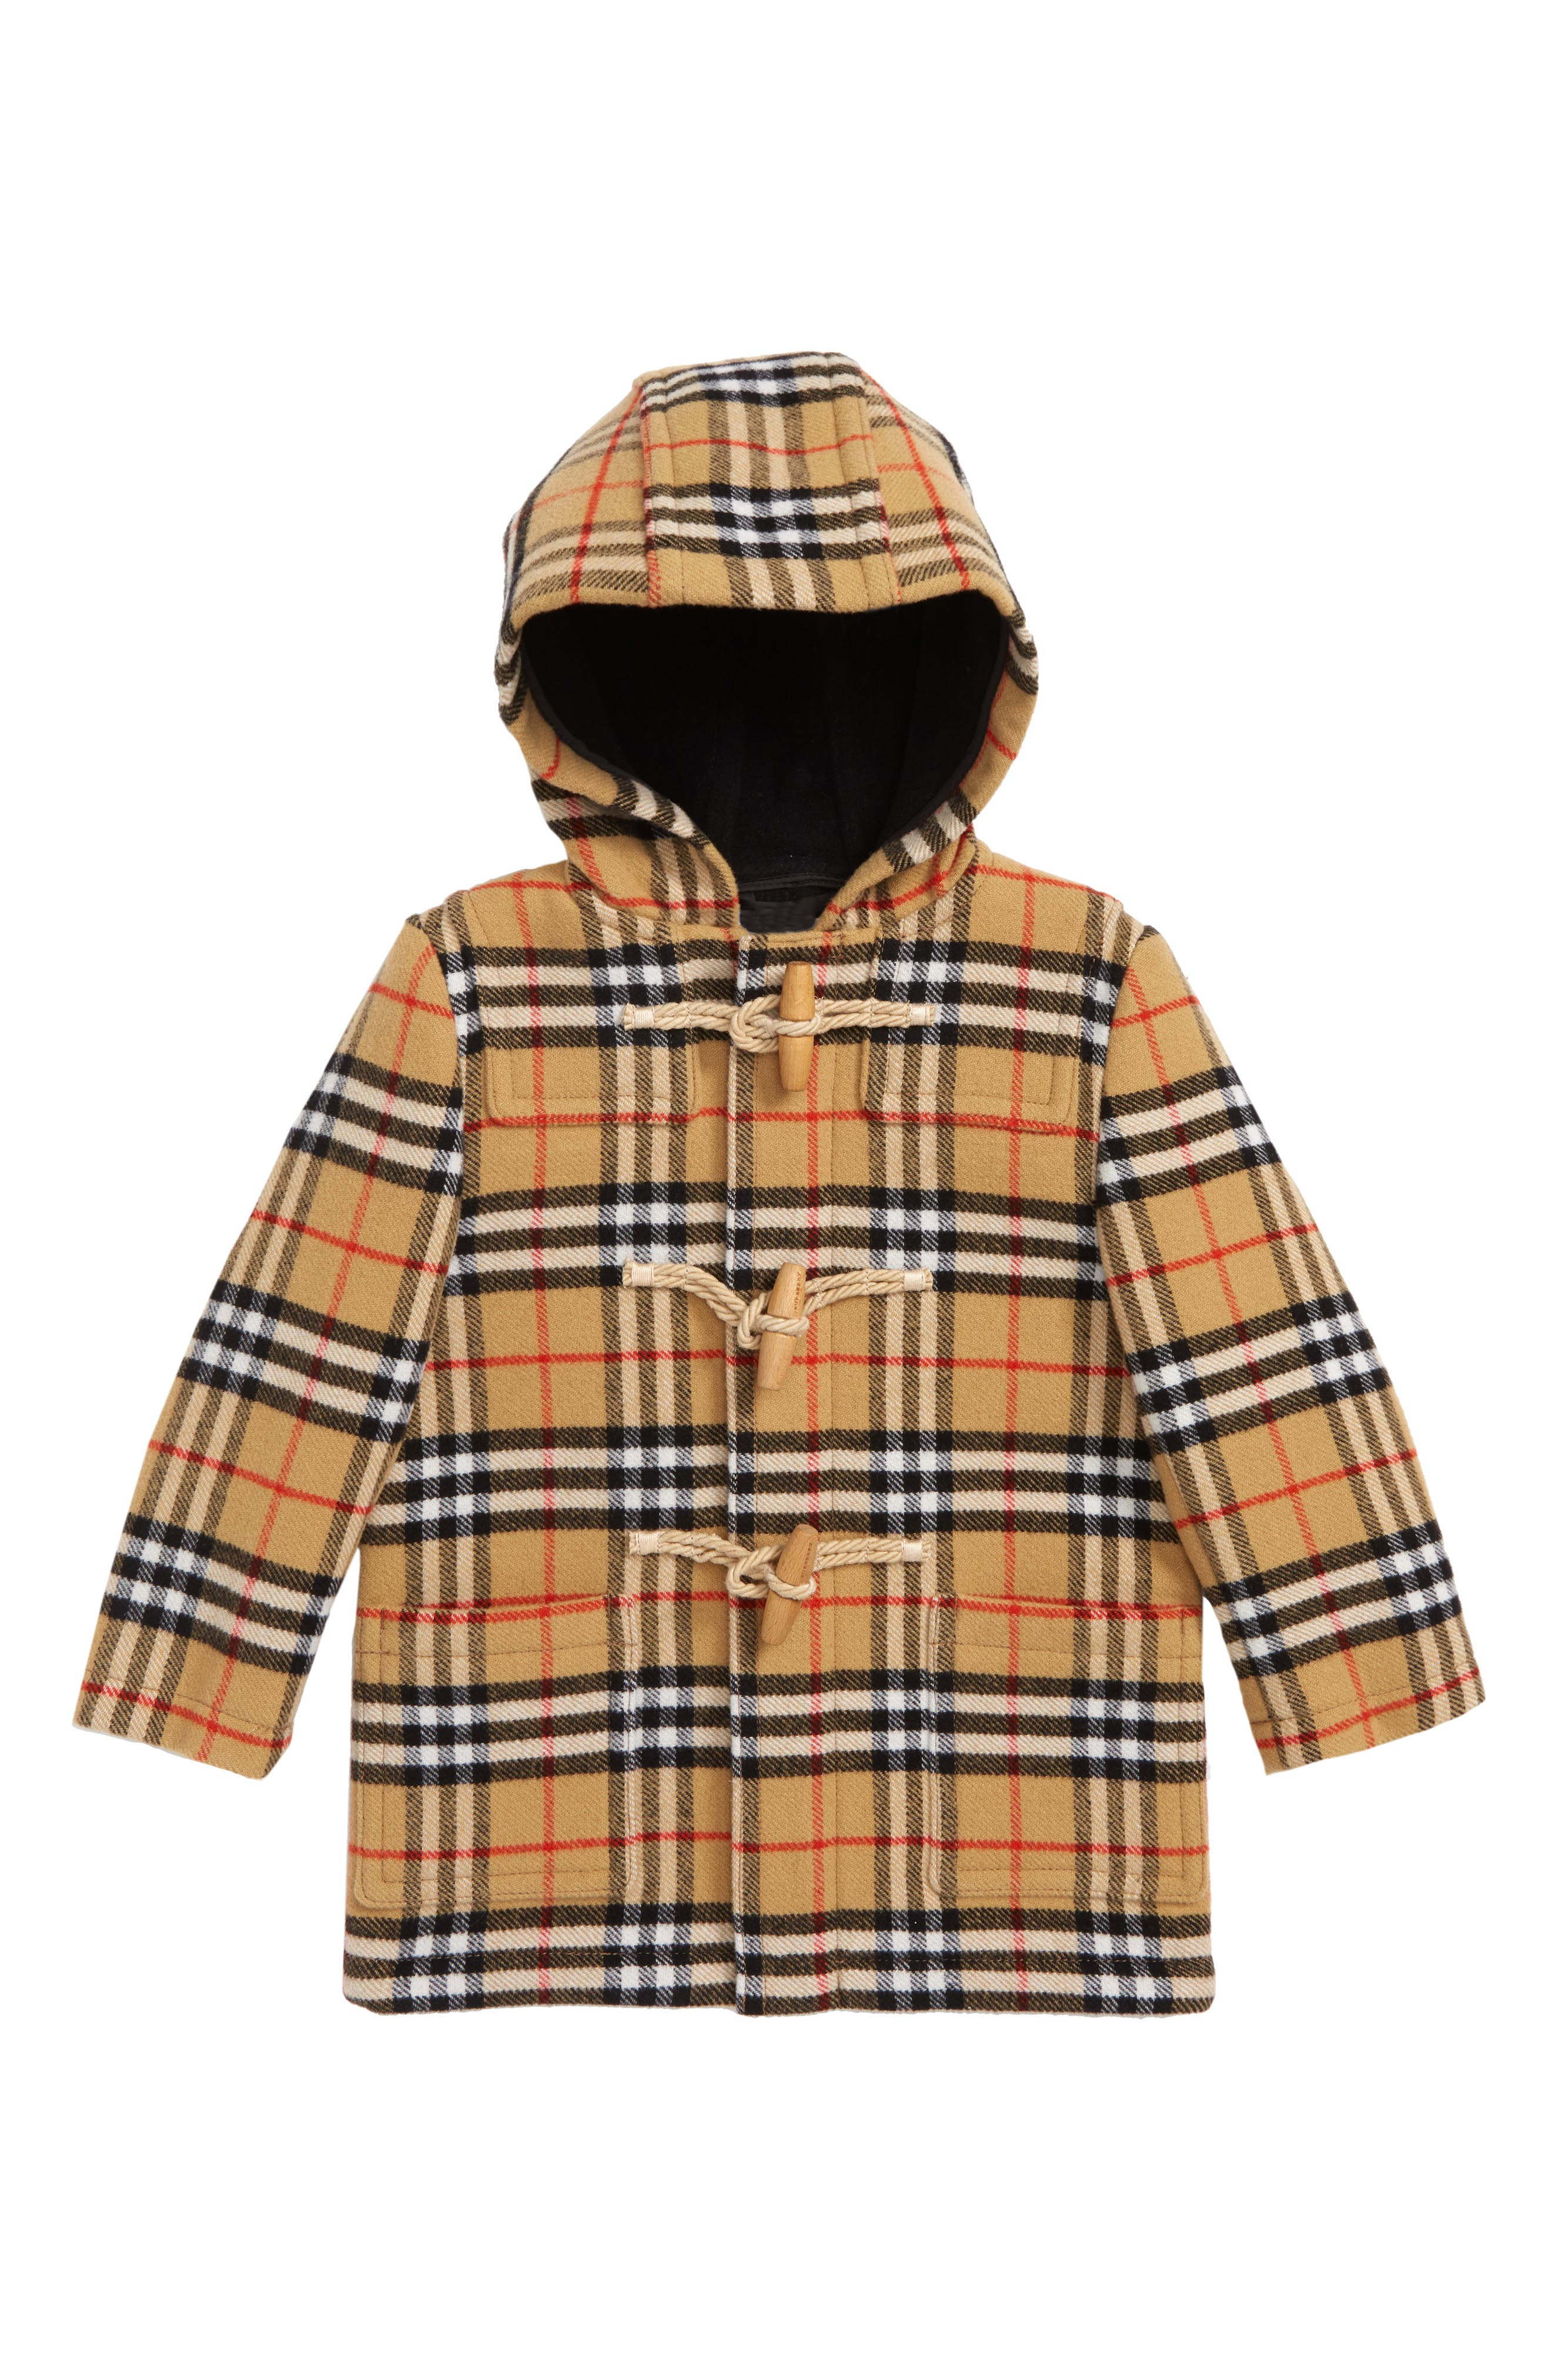 BURBERRY, Brogan Hooded Wool Toggle Coat, Main thumbnail 1, color, 001